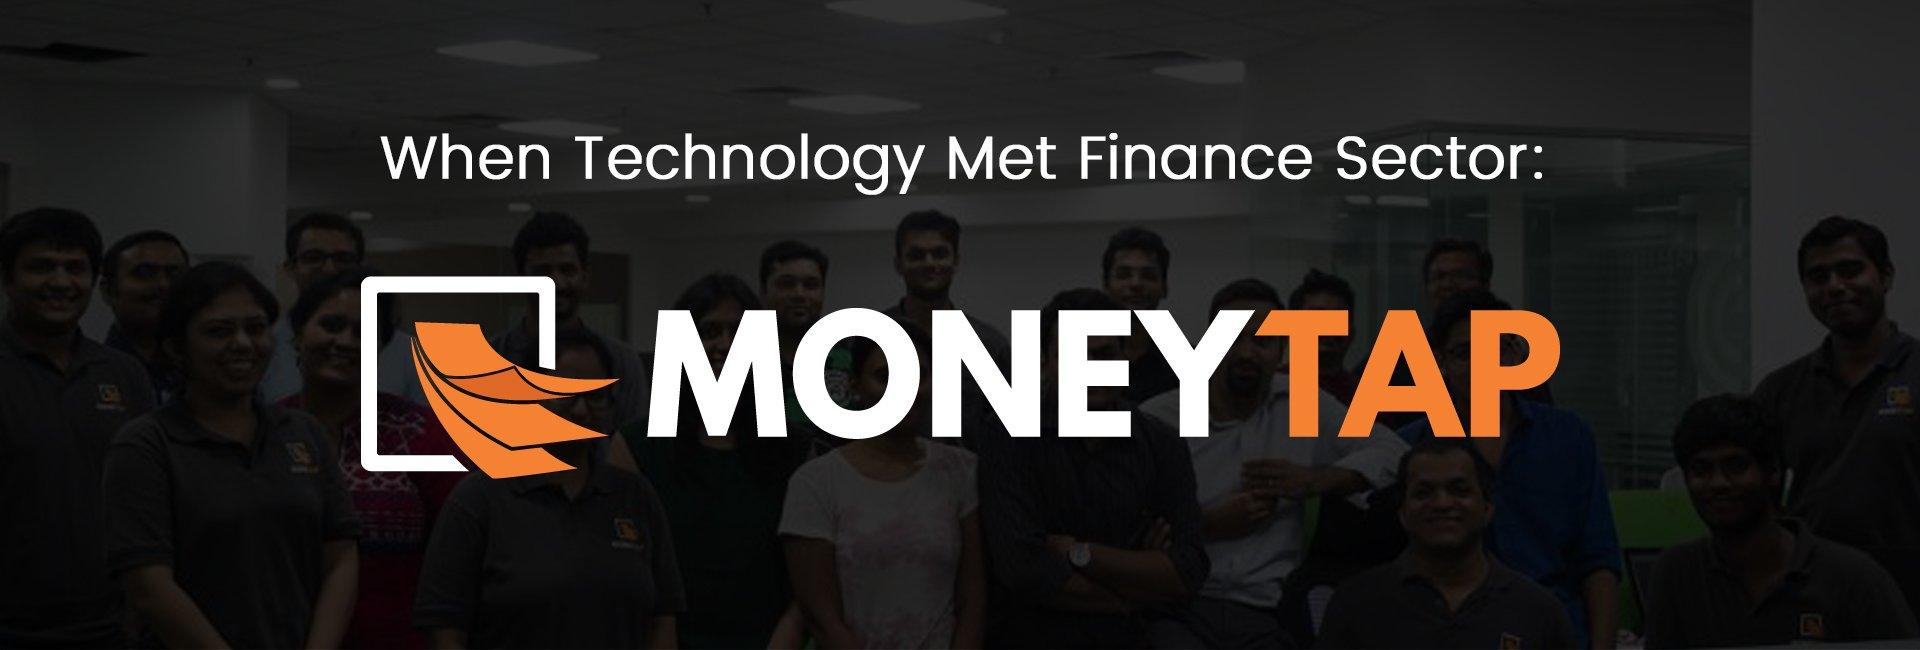 Money Tap Credit Line App